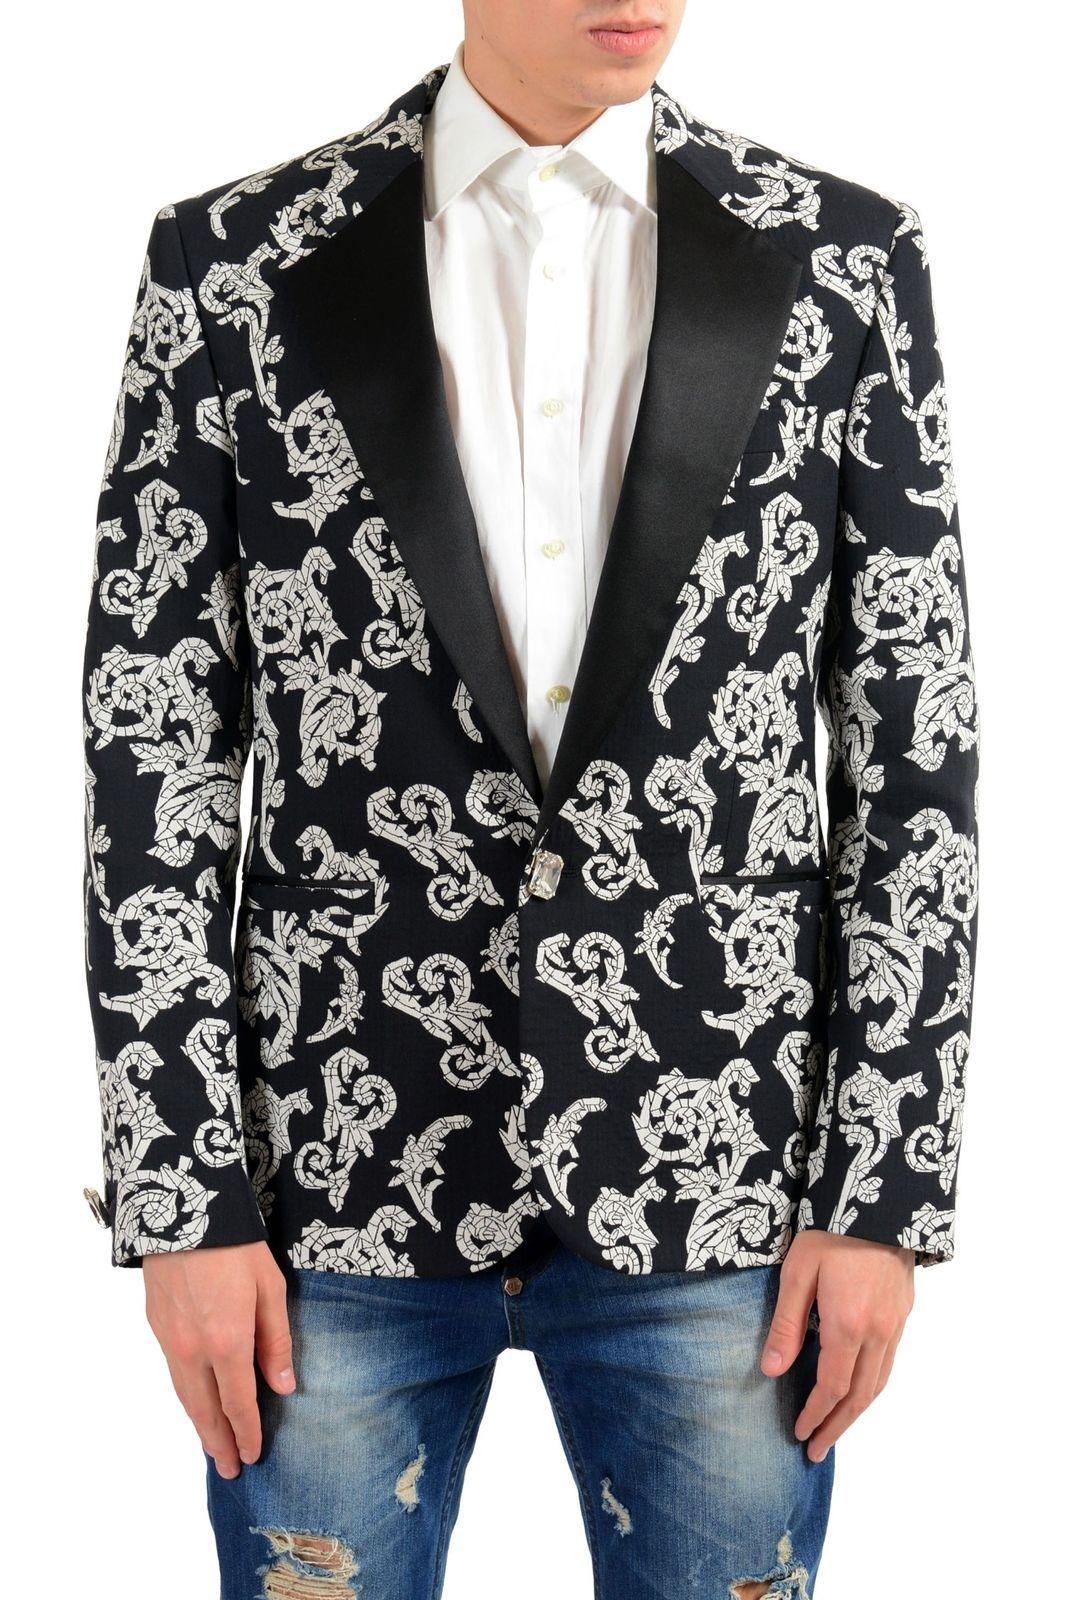 c5bbd3f6c 552.49 | Versace Men's Silk Jacquard Blazer Sport Coat Size 36 38 40 ...